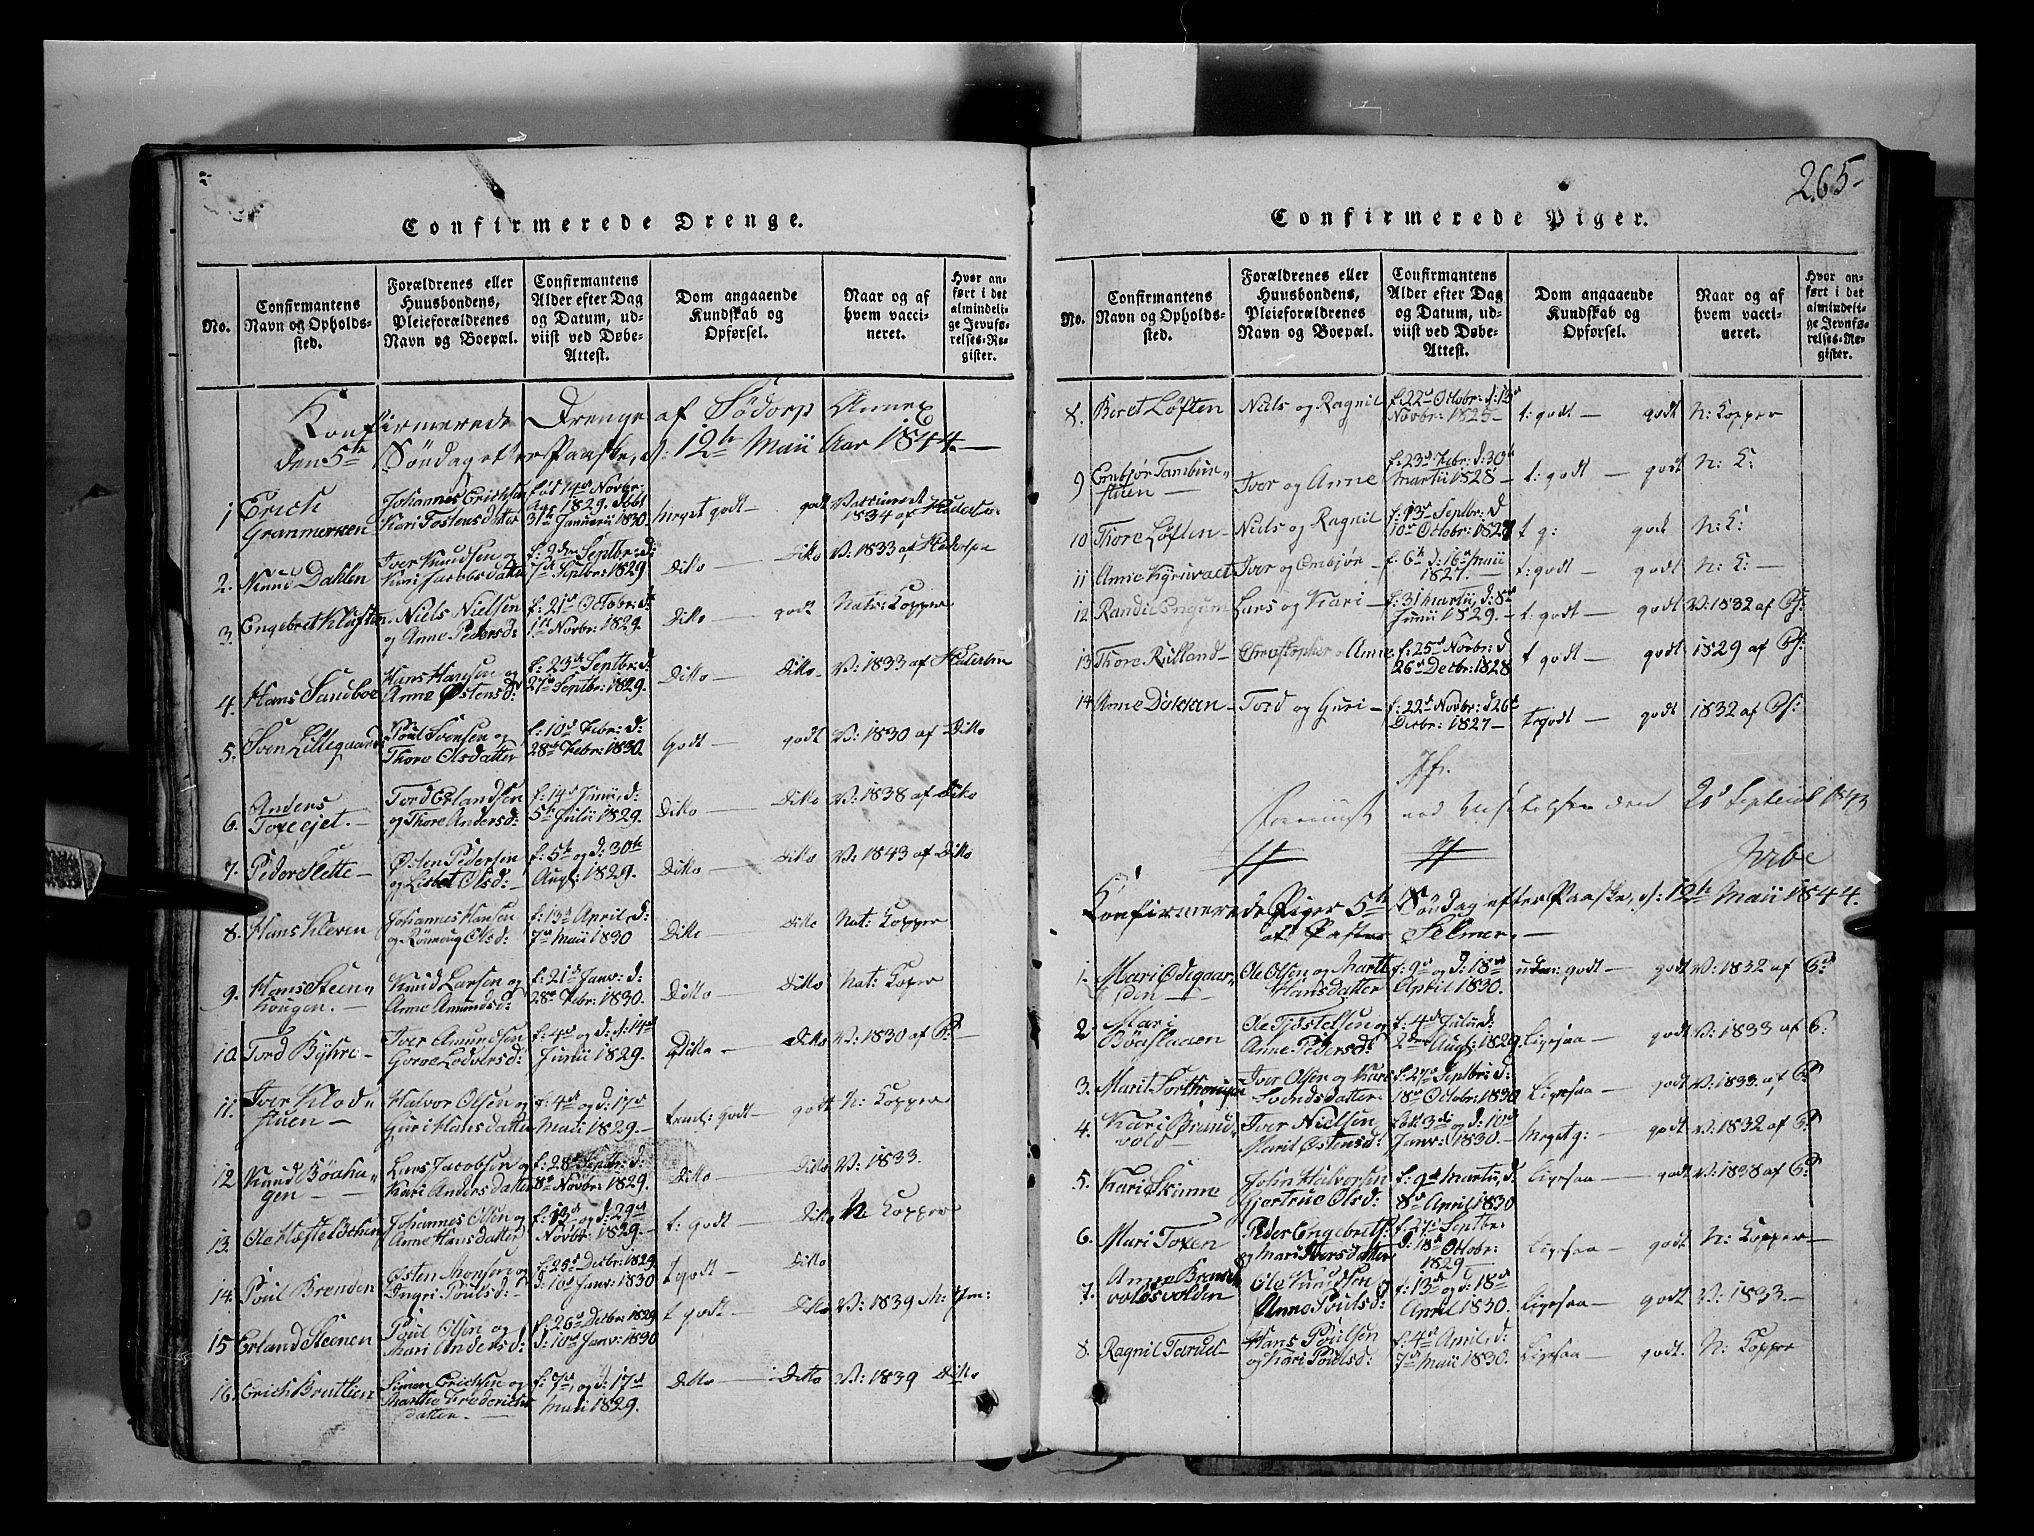 SAH, Fron prestekontor, H/Ha/Hab/L0004: Klokkerbok nr. 4, 1816-1850, s. 265